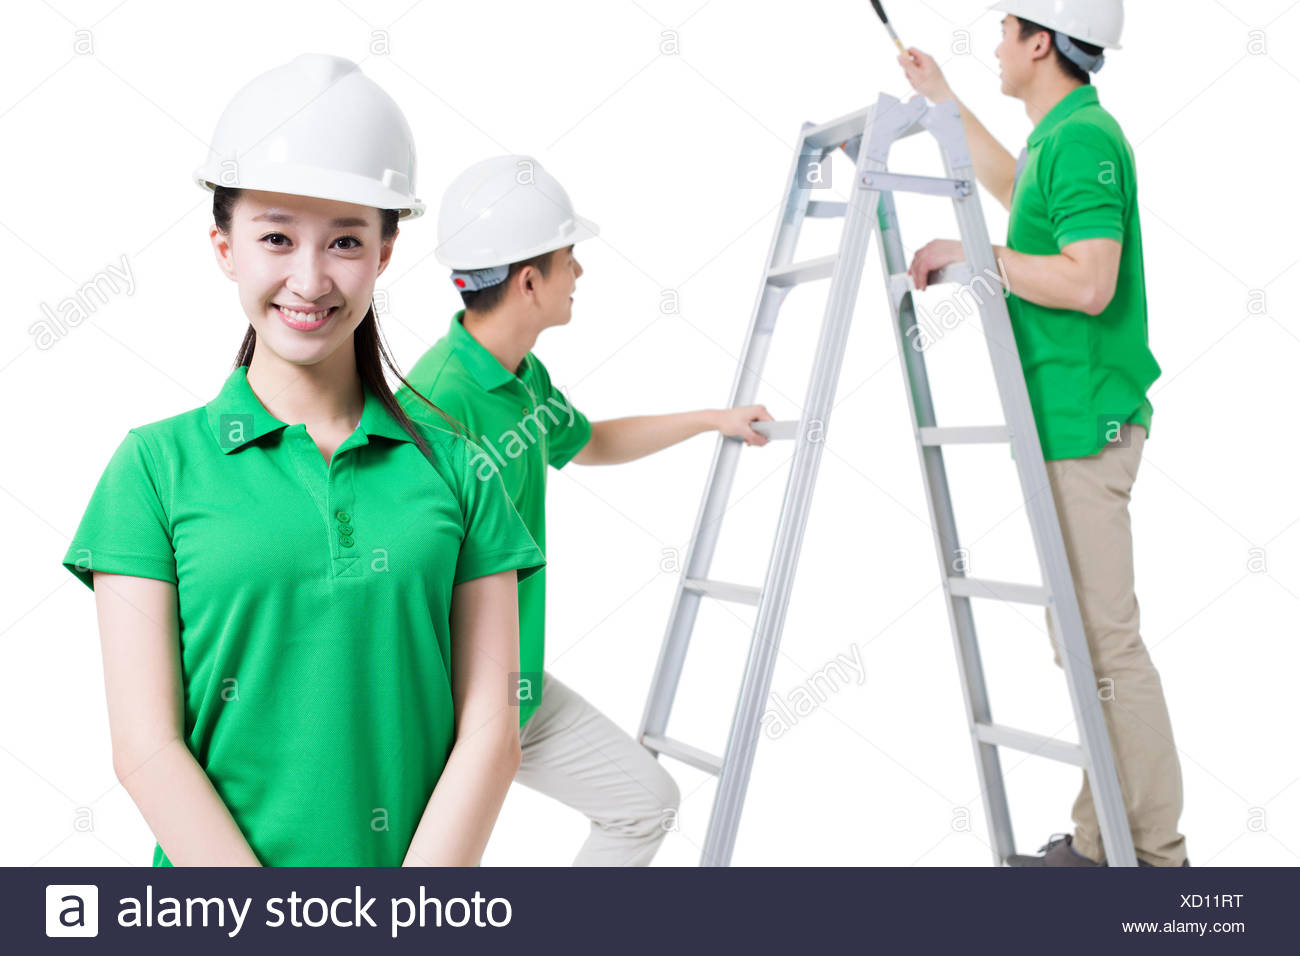 Volunteers working on construction site - Stock Image